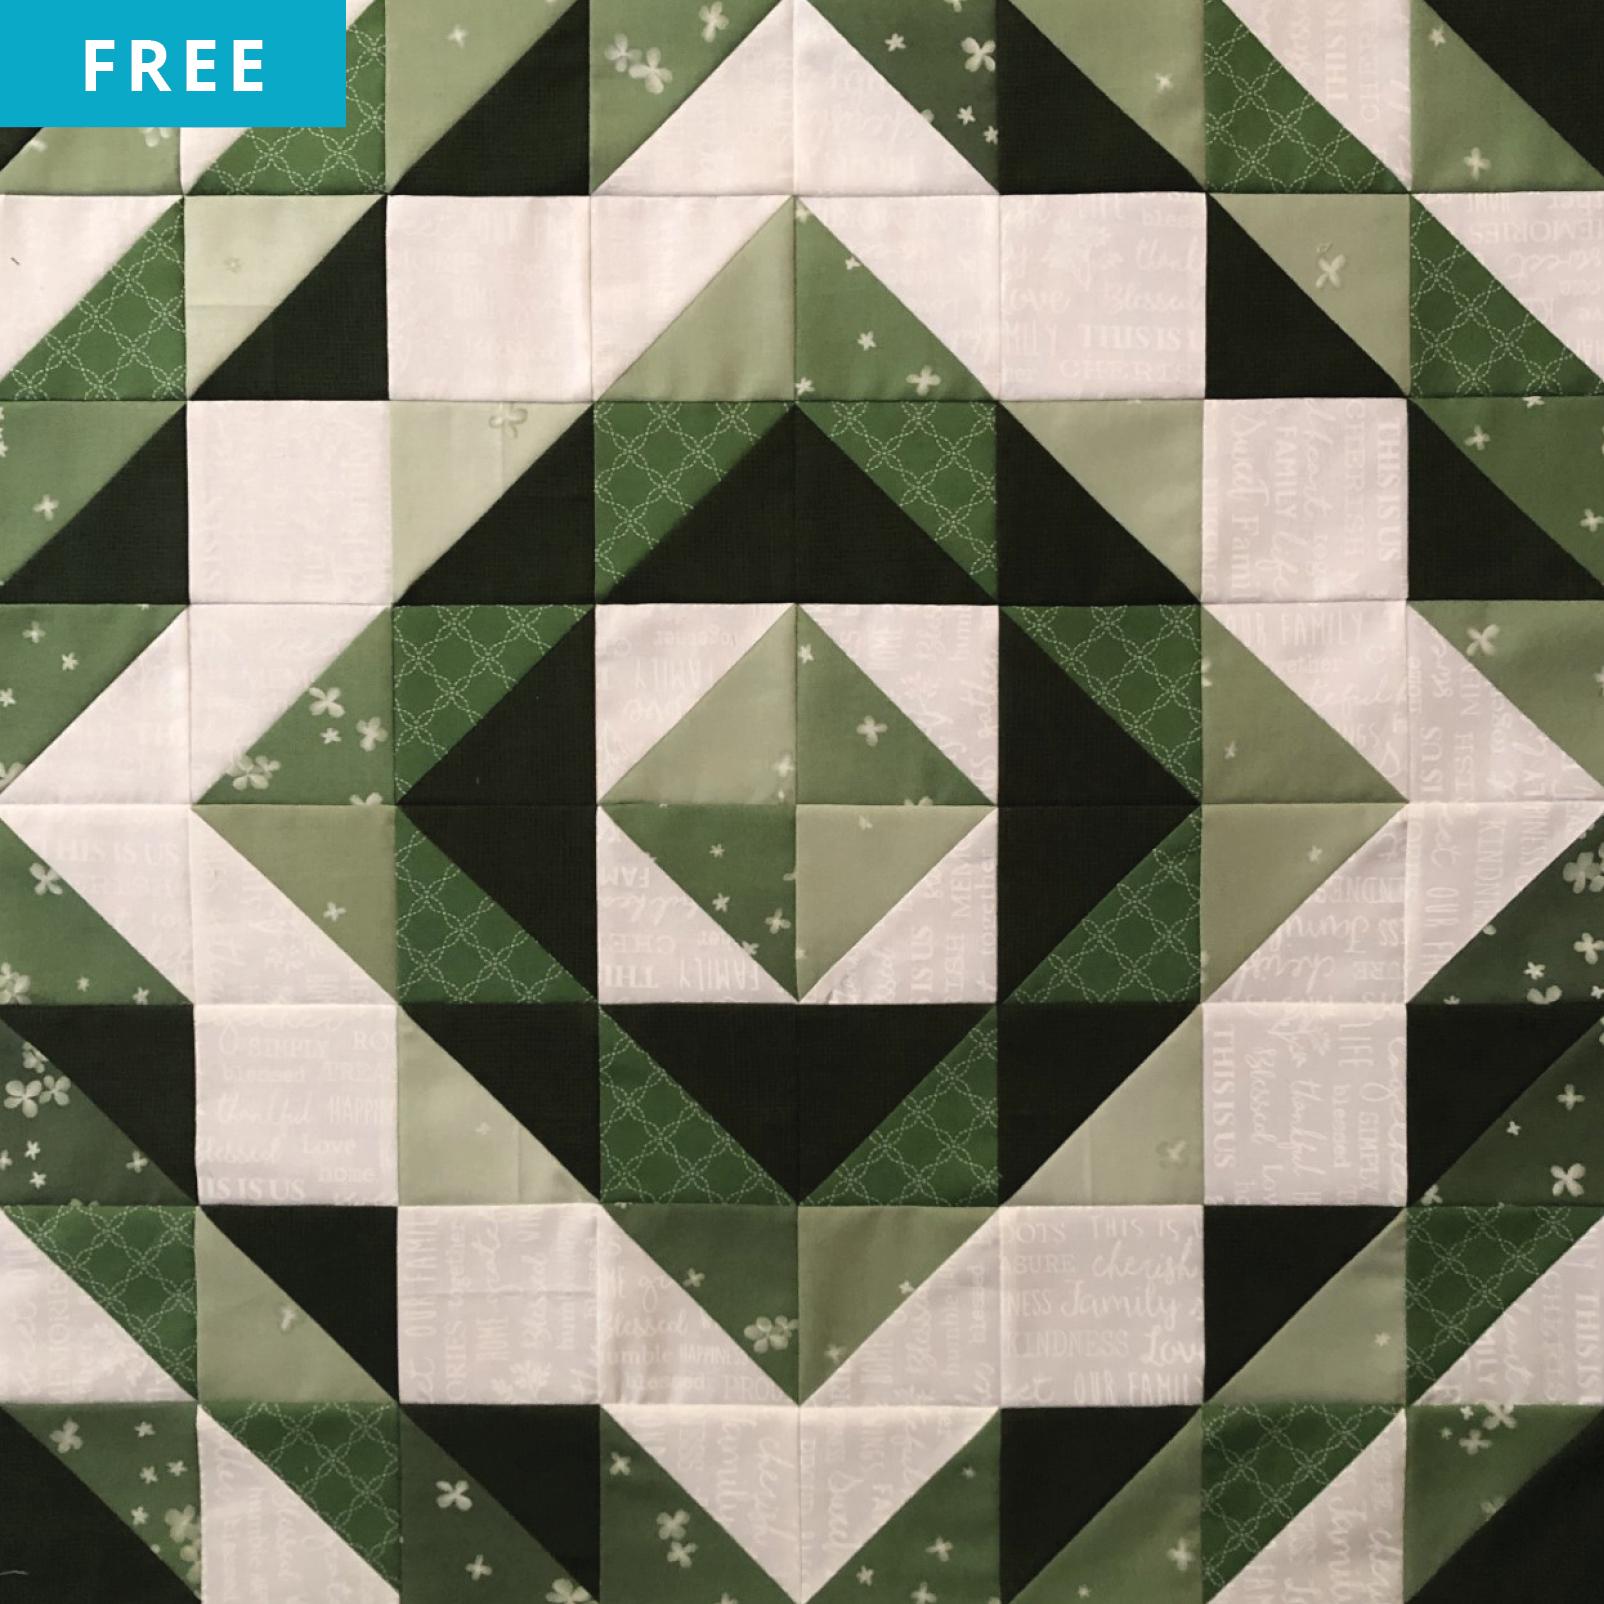 Free Quilt Pattern - Emerald Eyes